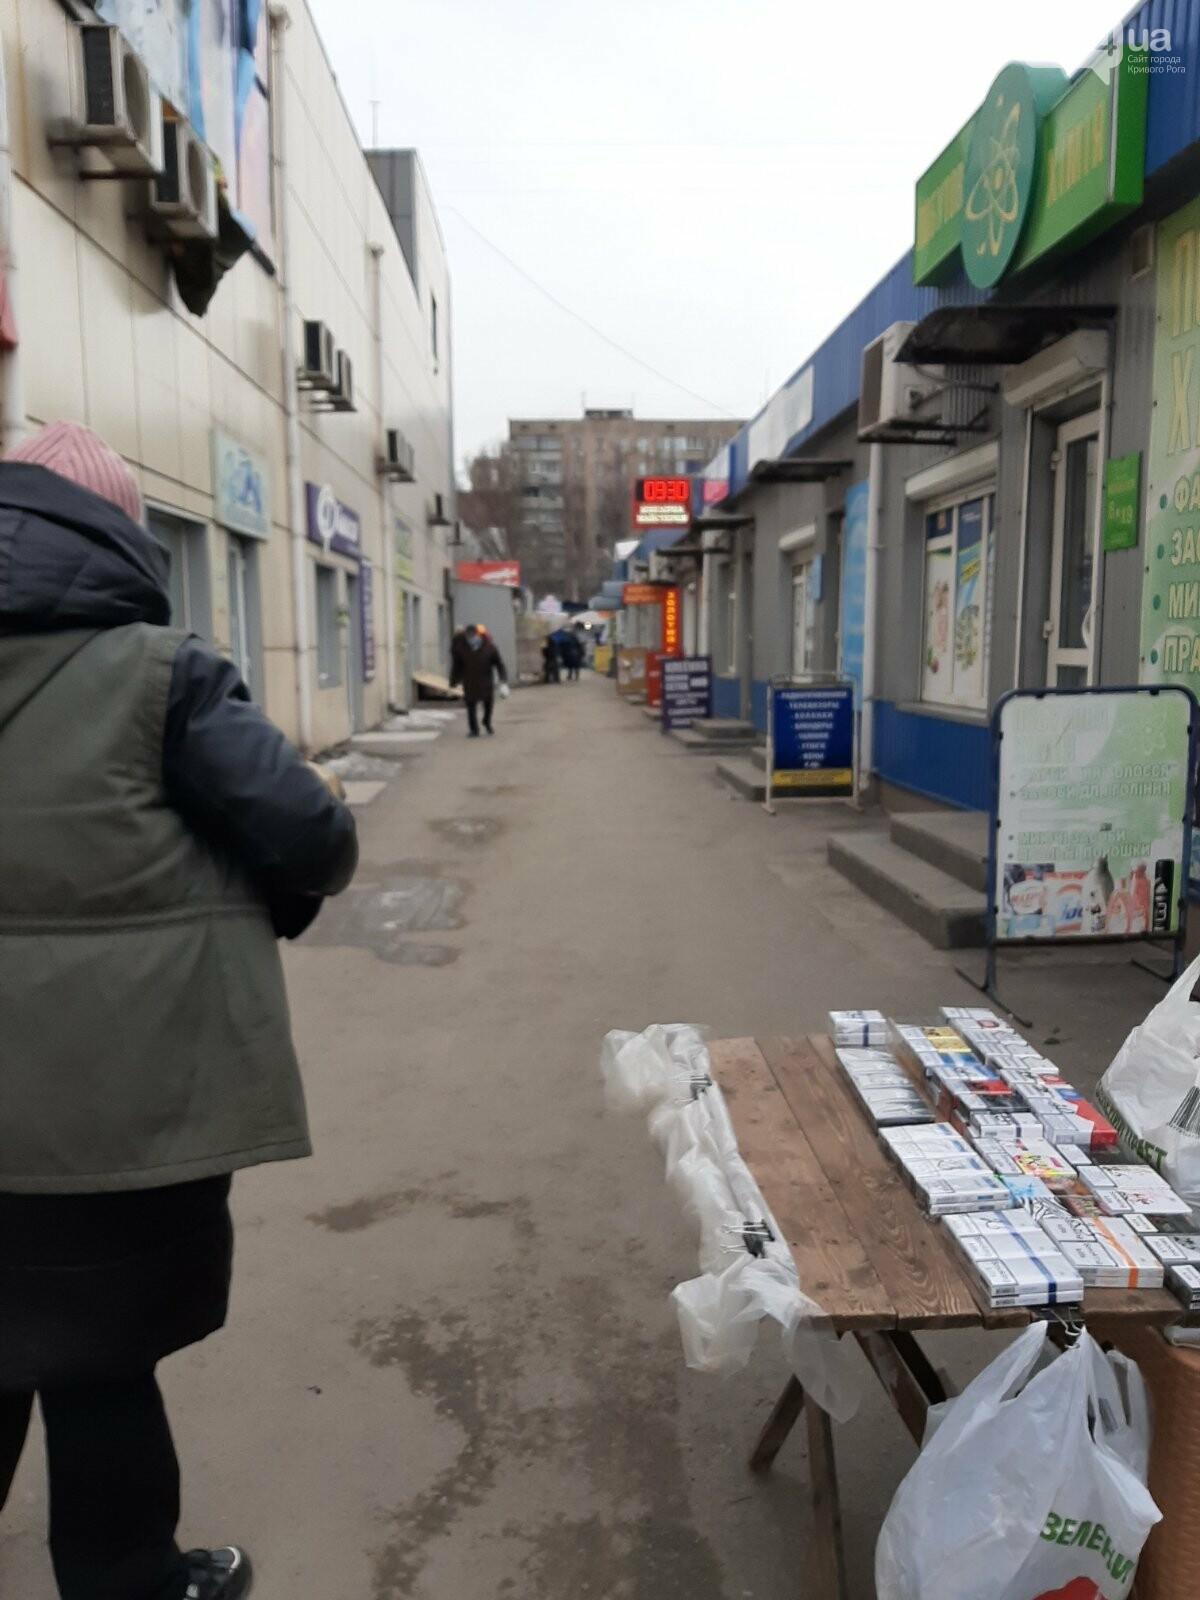 В Кривом Роге изъяли почти 500 пачек сигарет без акцизных марок, - ФОТО , фото-10